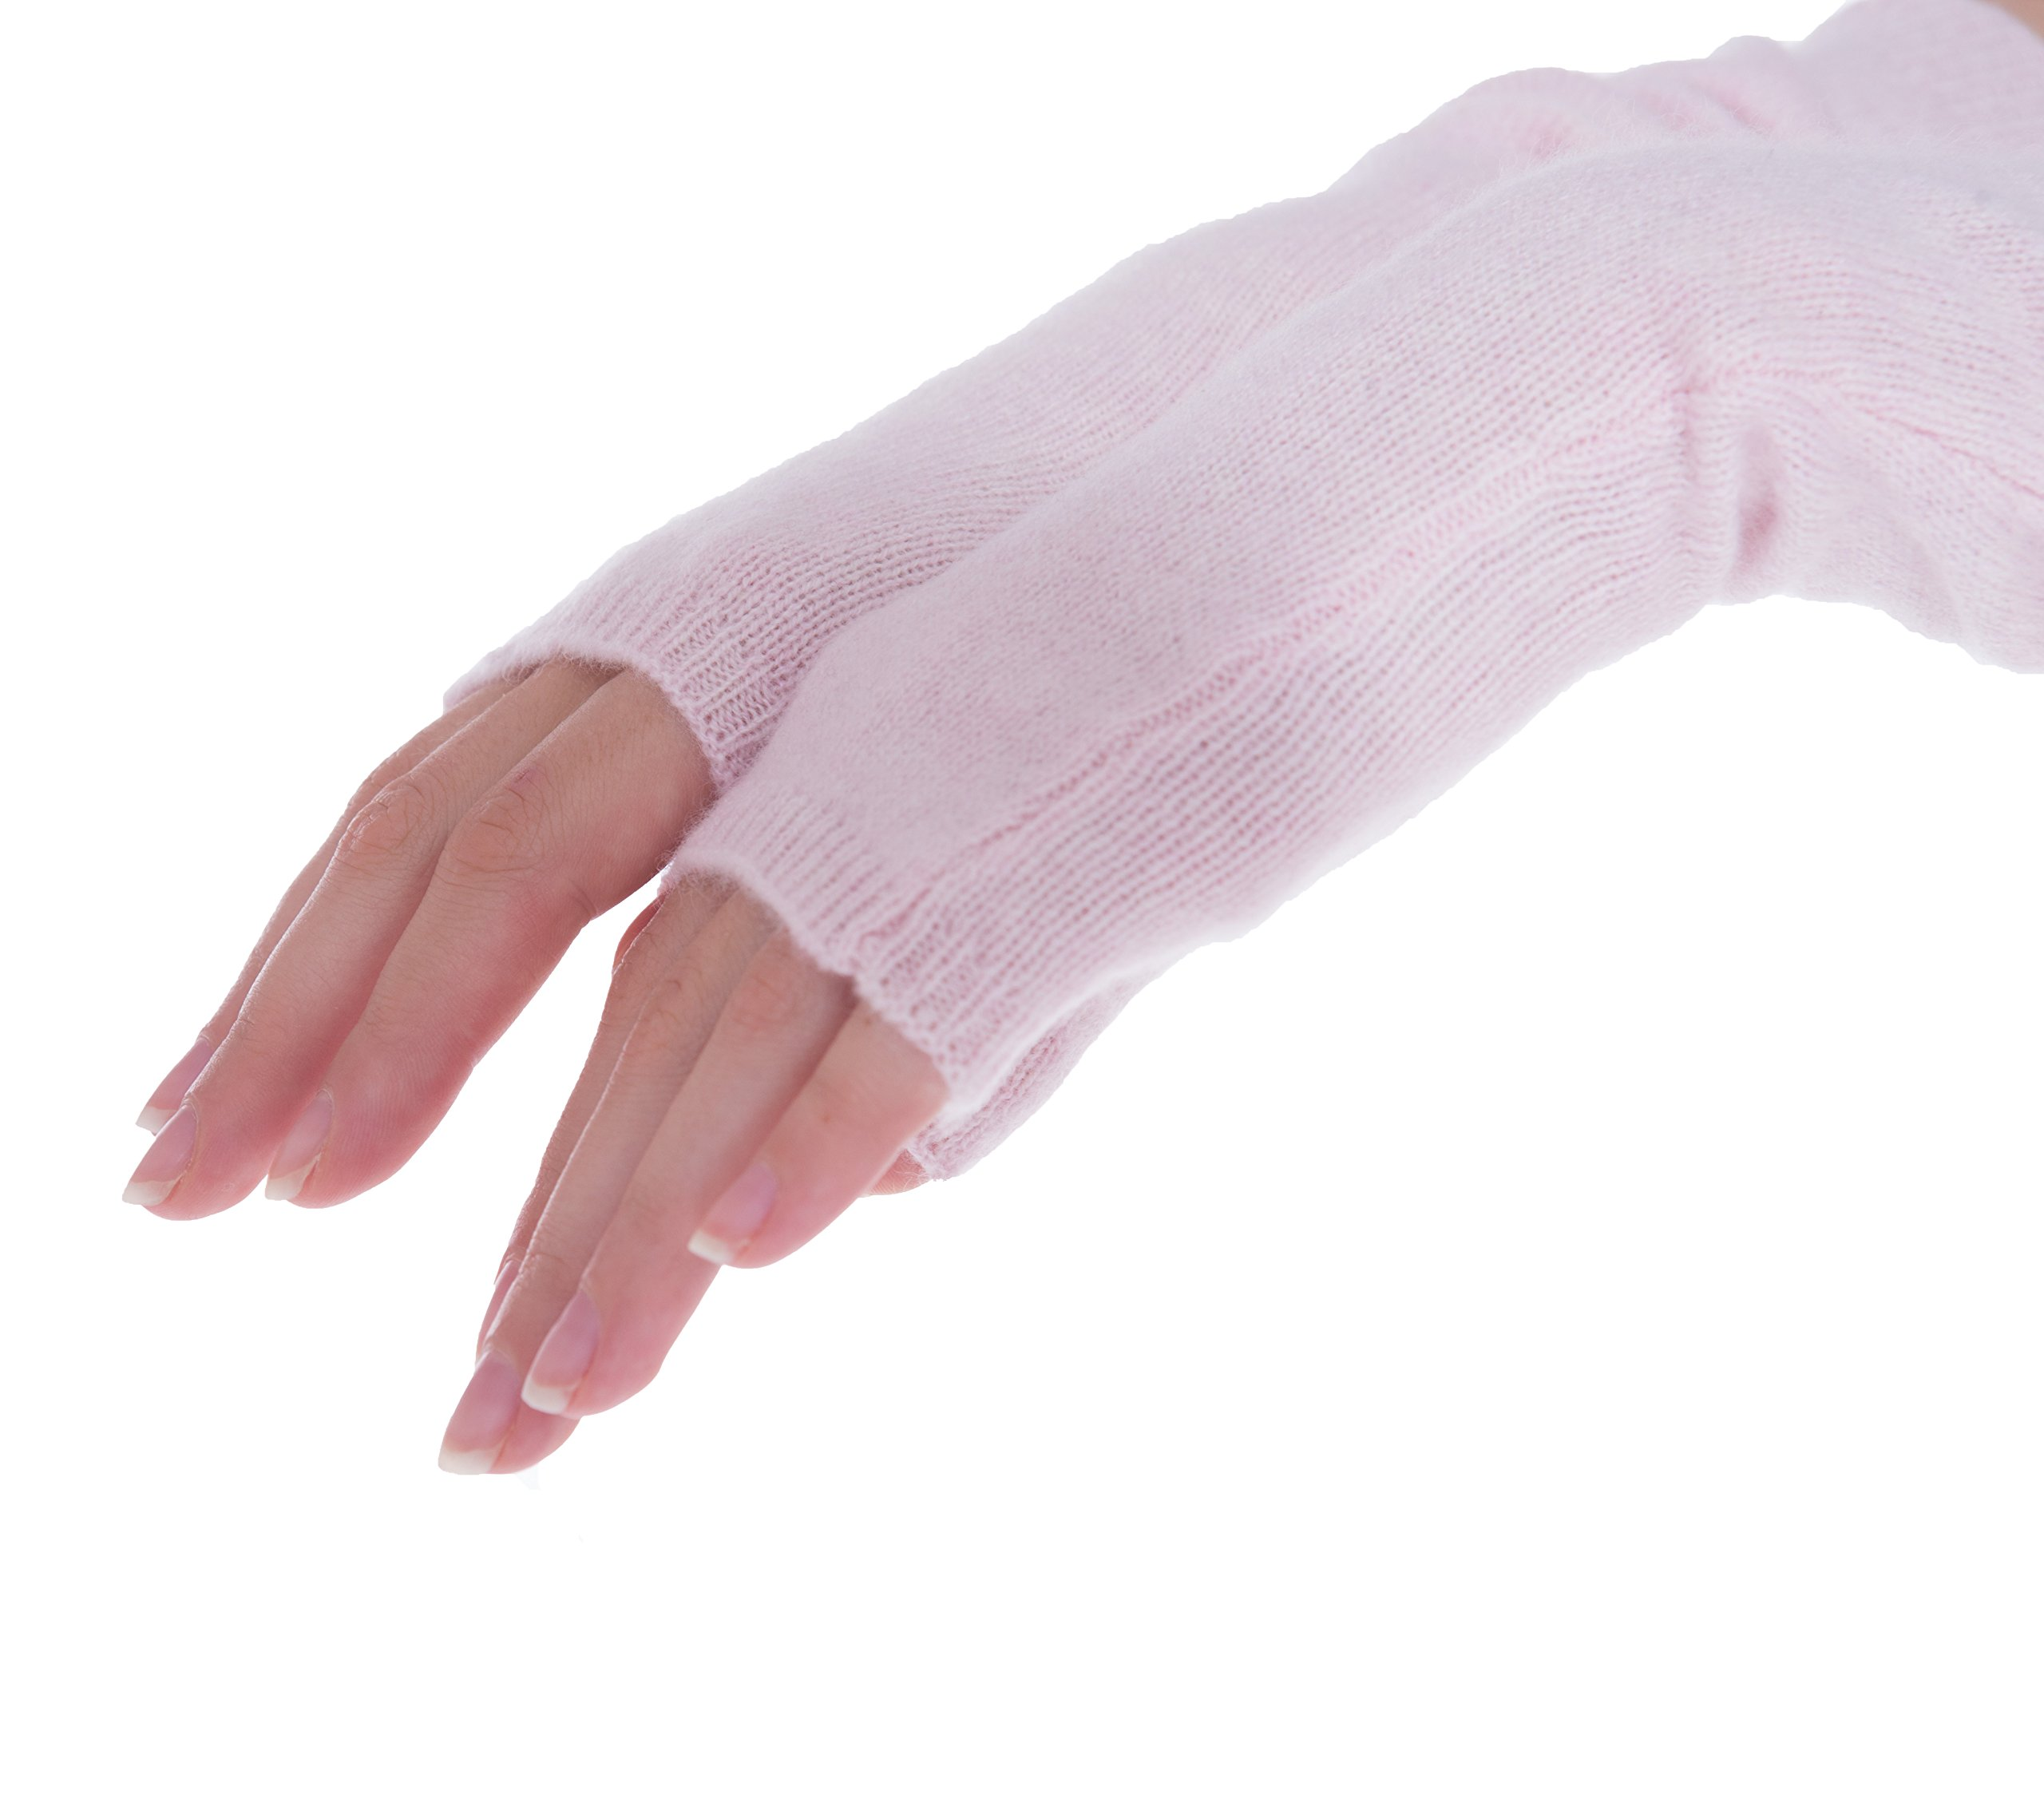 cashmere 4 U Women's 100% Cashmere Long Sleeve Fingerless Mitten Gloves (Givre) by cashmere 4 U (Image #5)